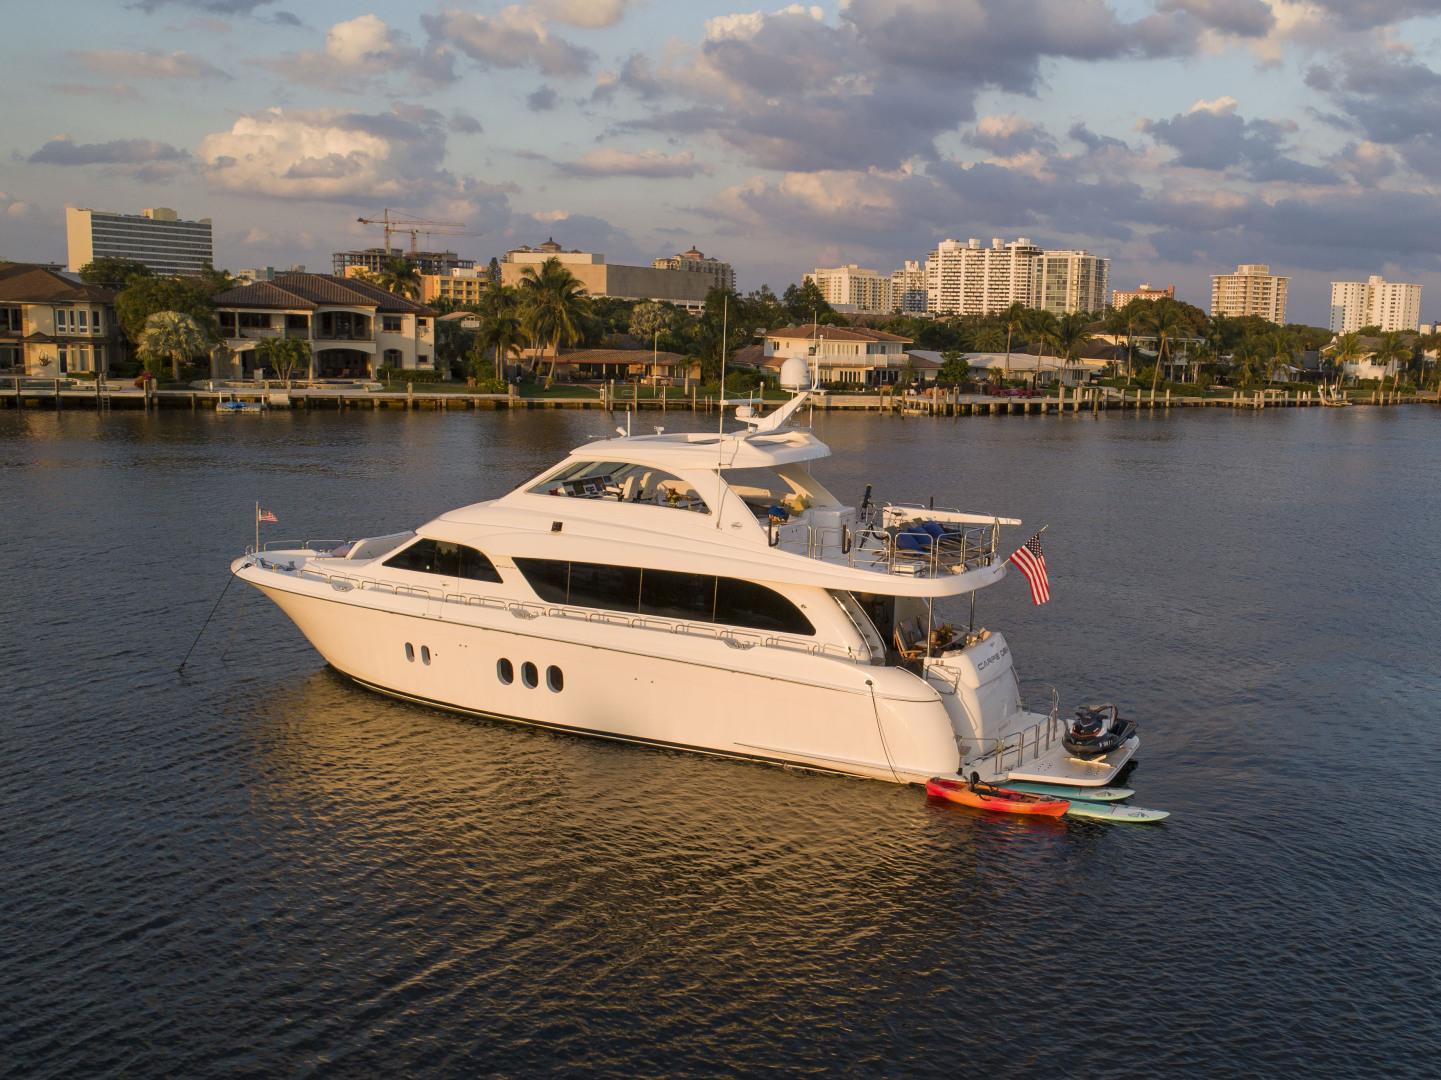 Hatteras-72 2008-CARPE DIEM Ft. Lauderdale-Florida-United States-1259284   Thumbnail